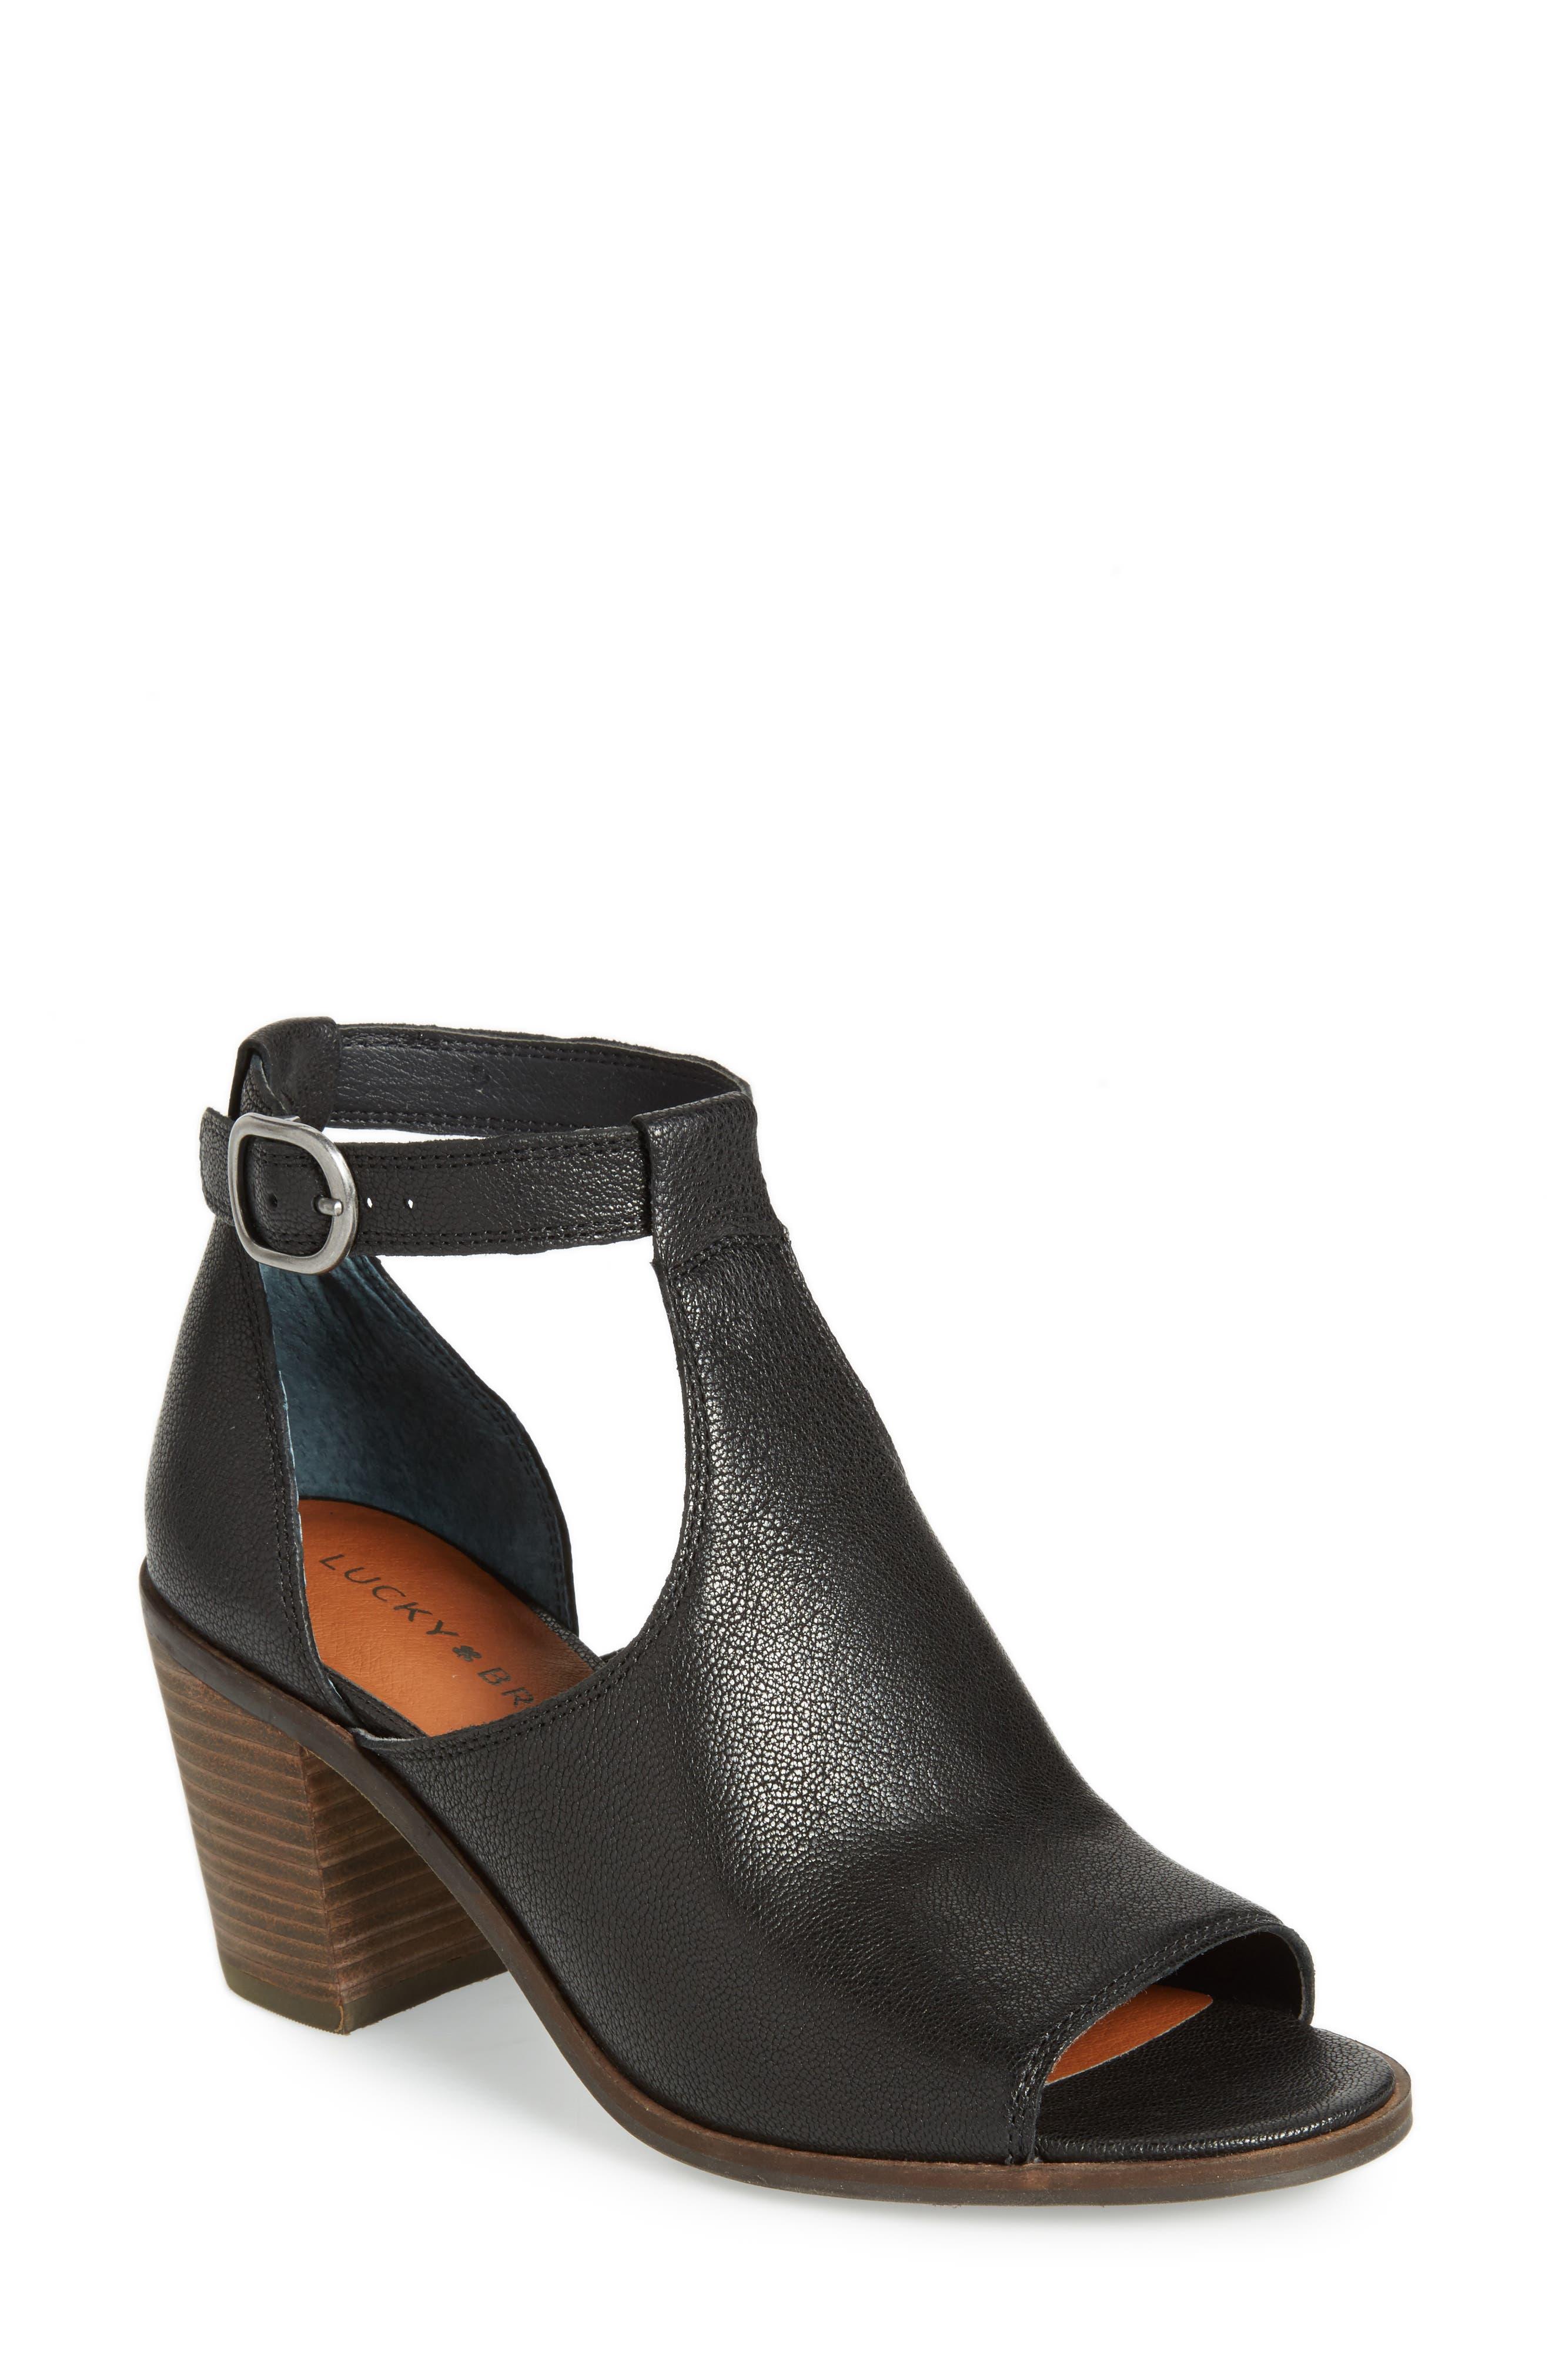 Kadian Block Heel Sandal,                         Main,                         color, Black Leather